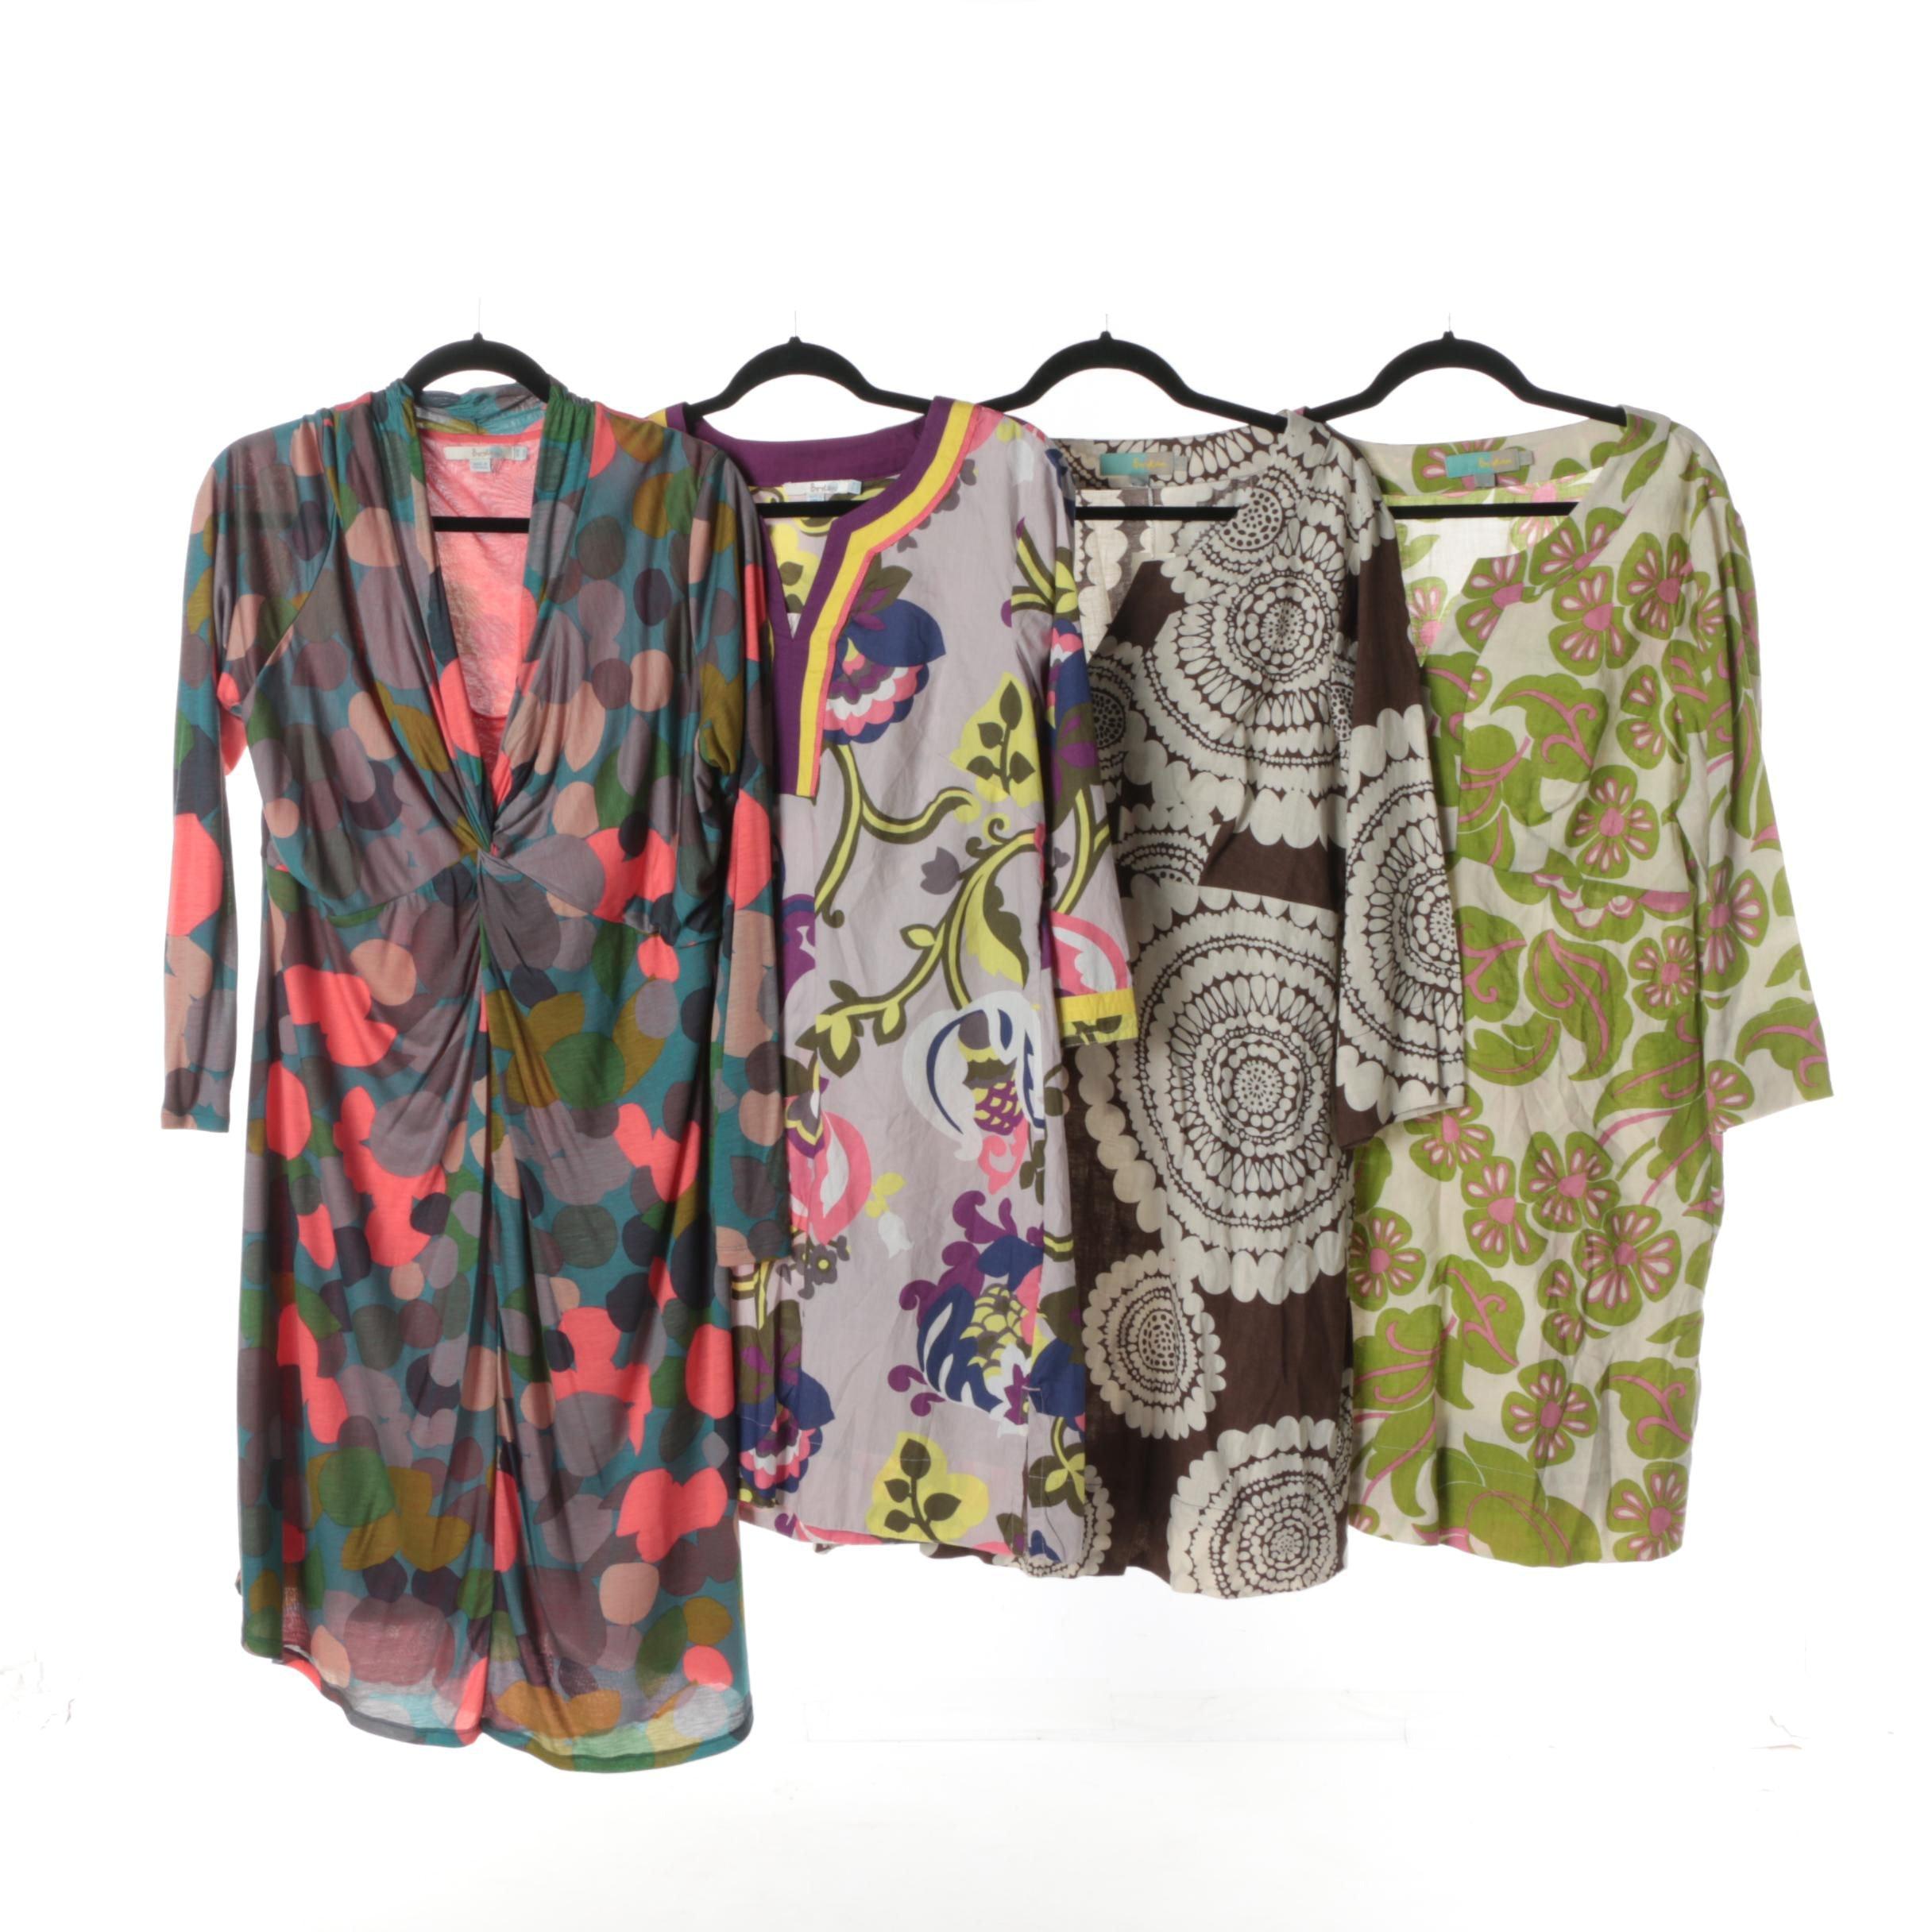 Women's Boden Tunics and Dress